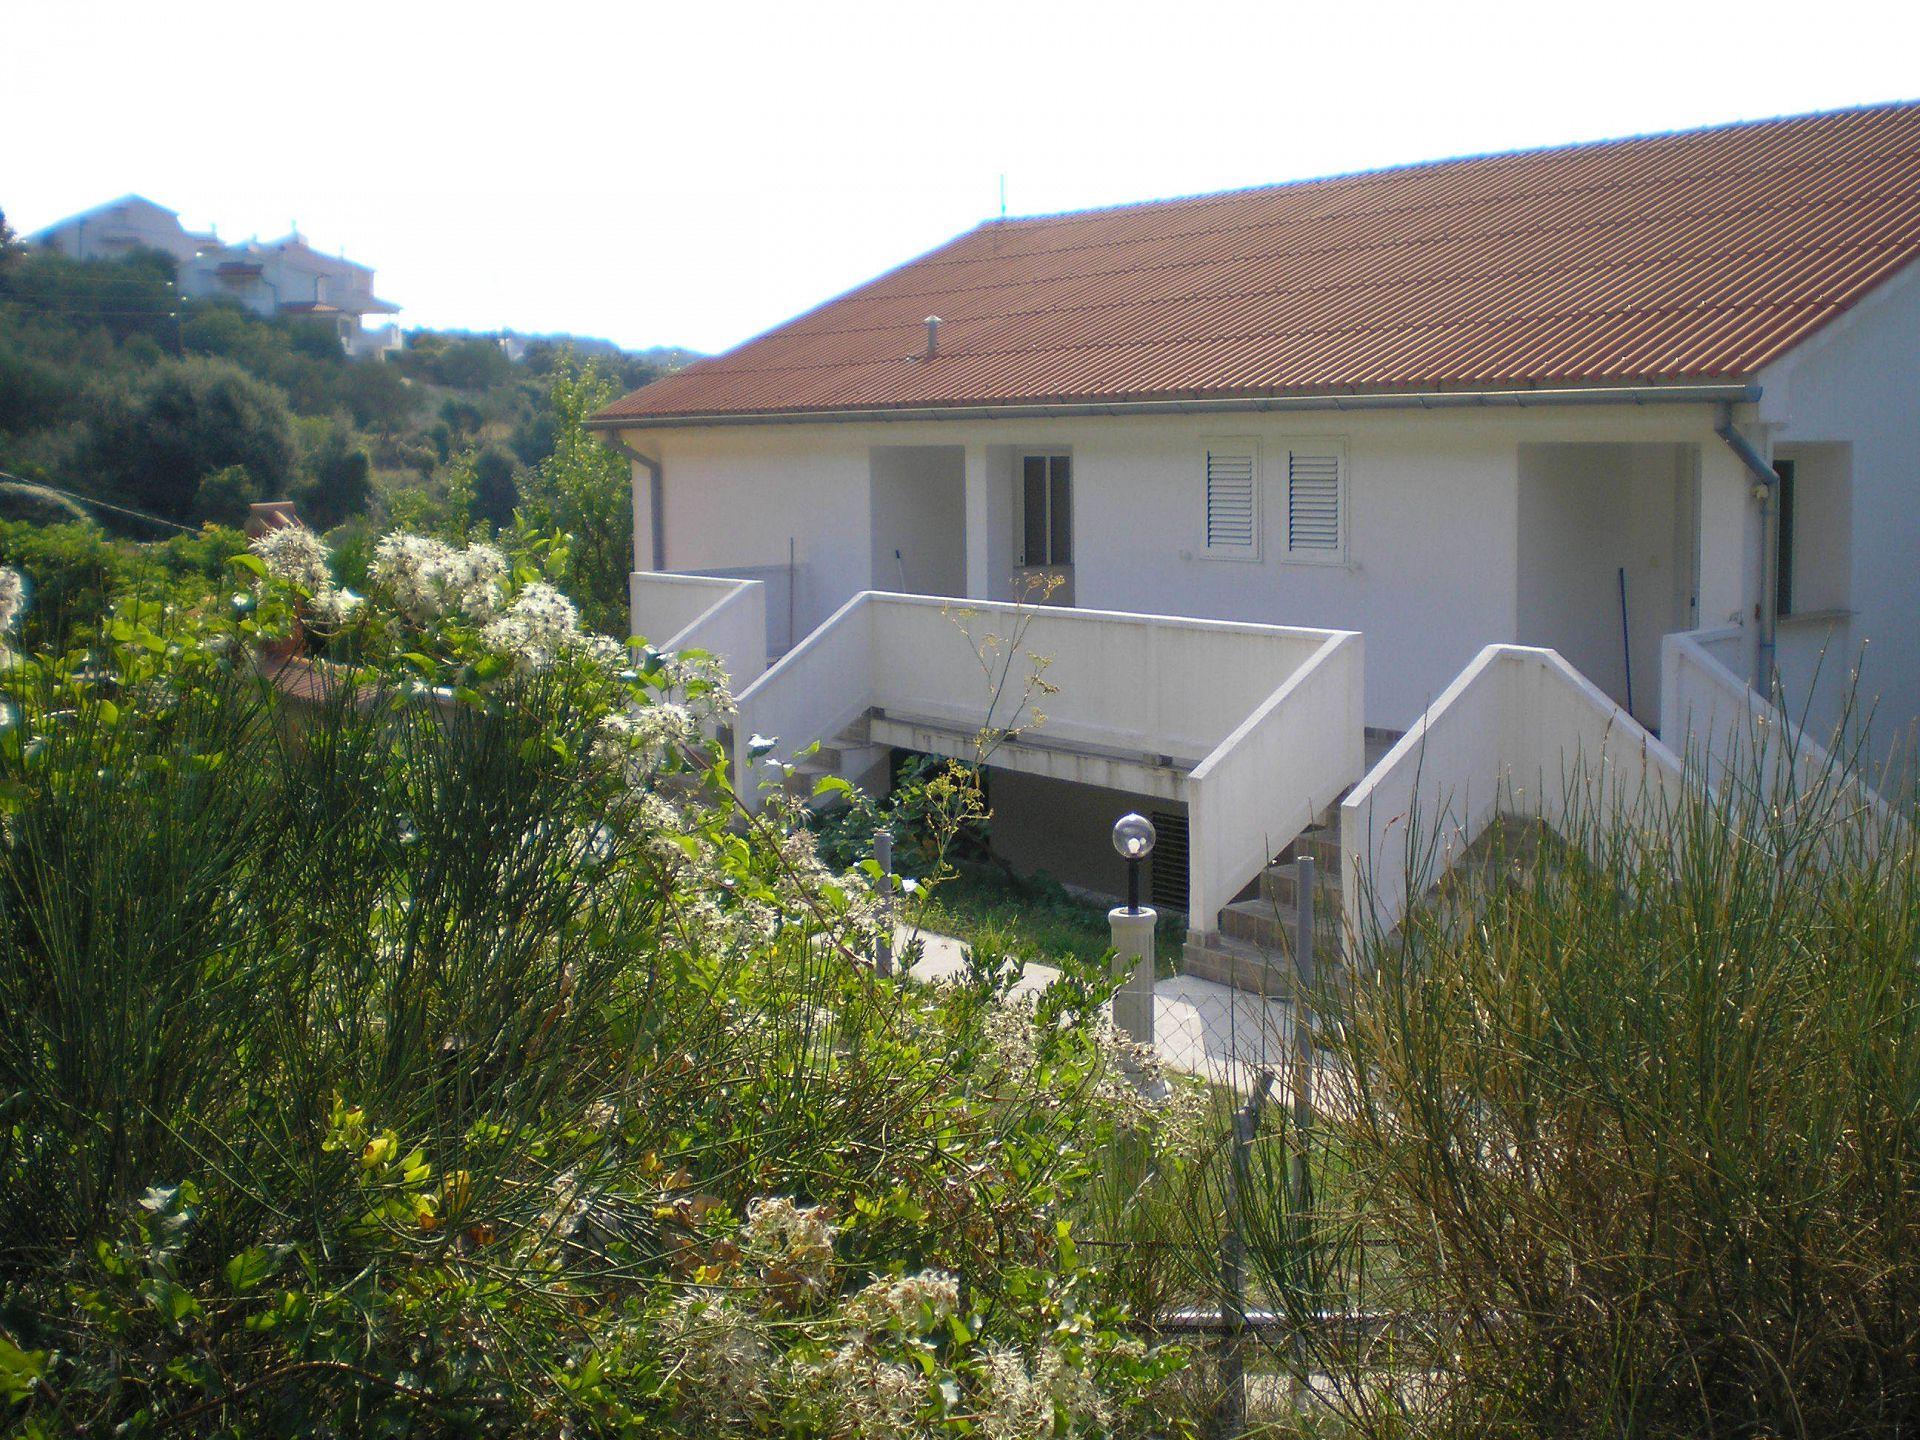 Apartamente Apartment Ren A3 Kampor, Island Rab 52555, Kampor, Rab, Primorsko-goranska